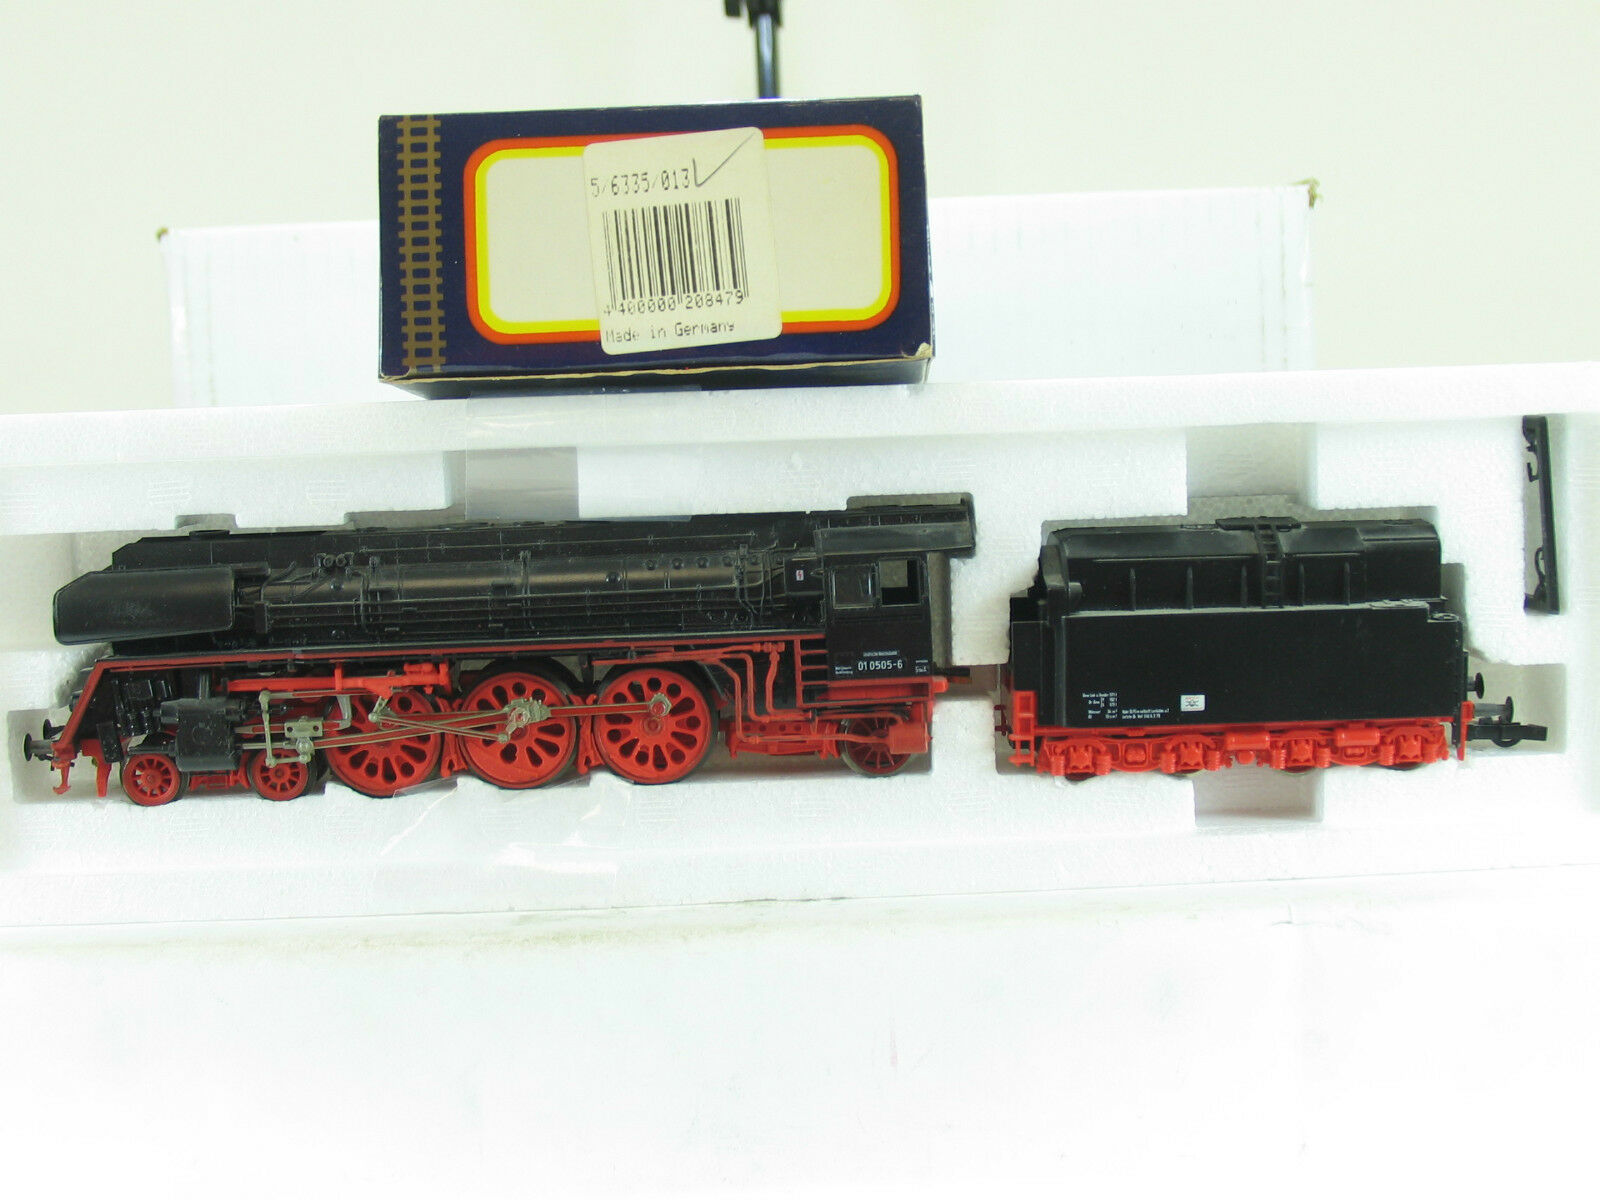 Piko h0 5 6335 – máquina de vapor br 010505-6 del Dr b1769